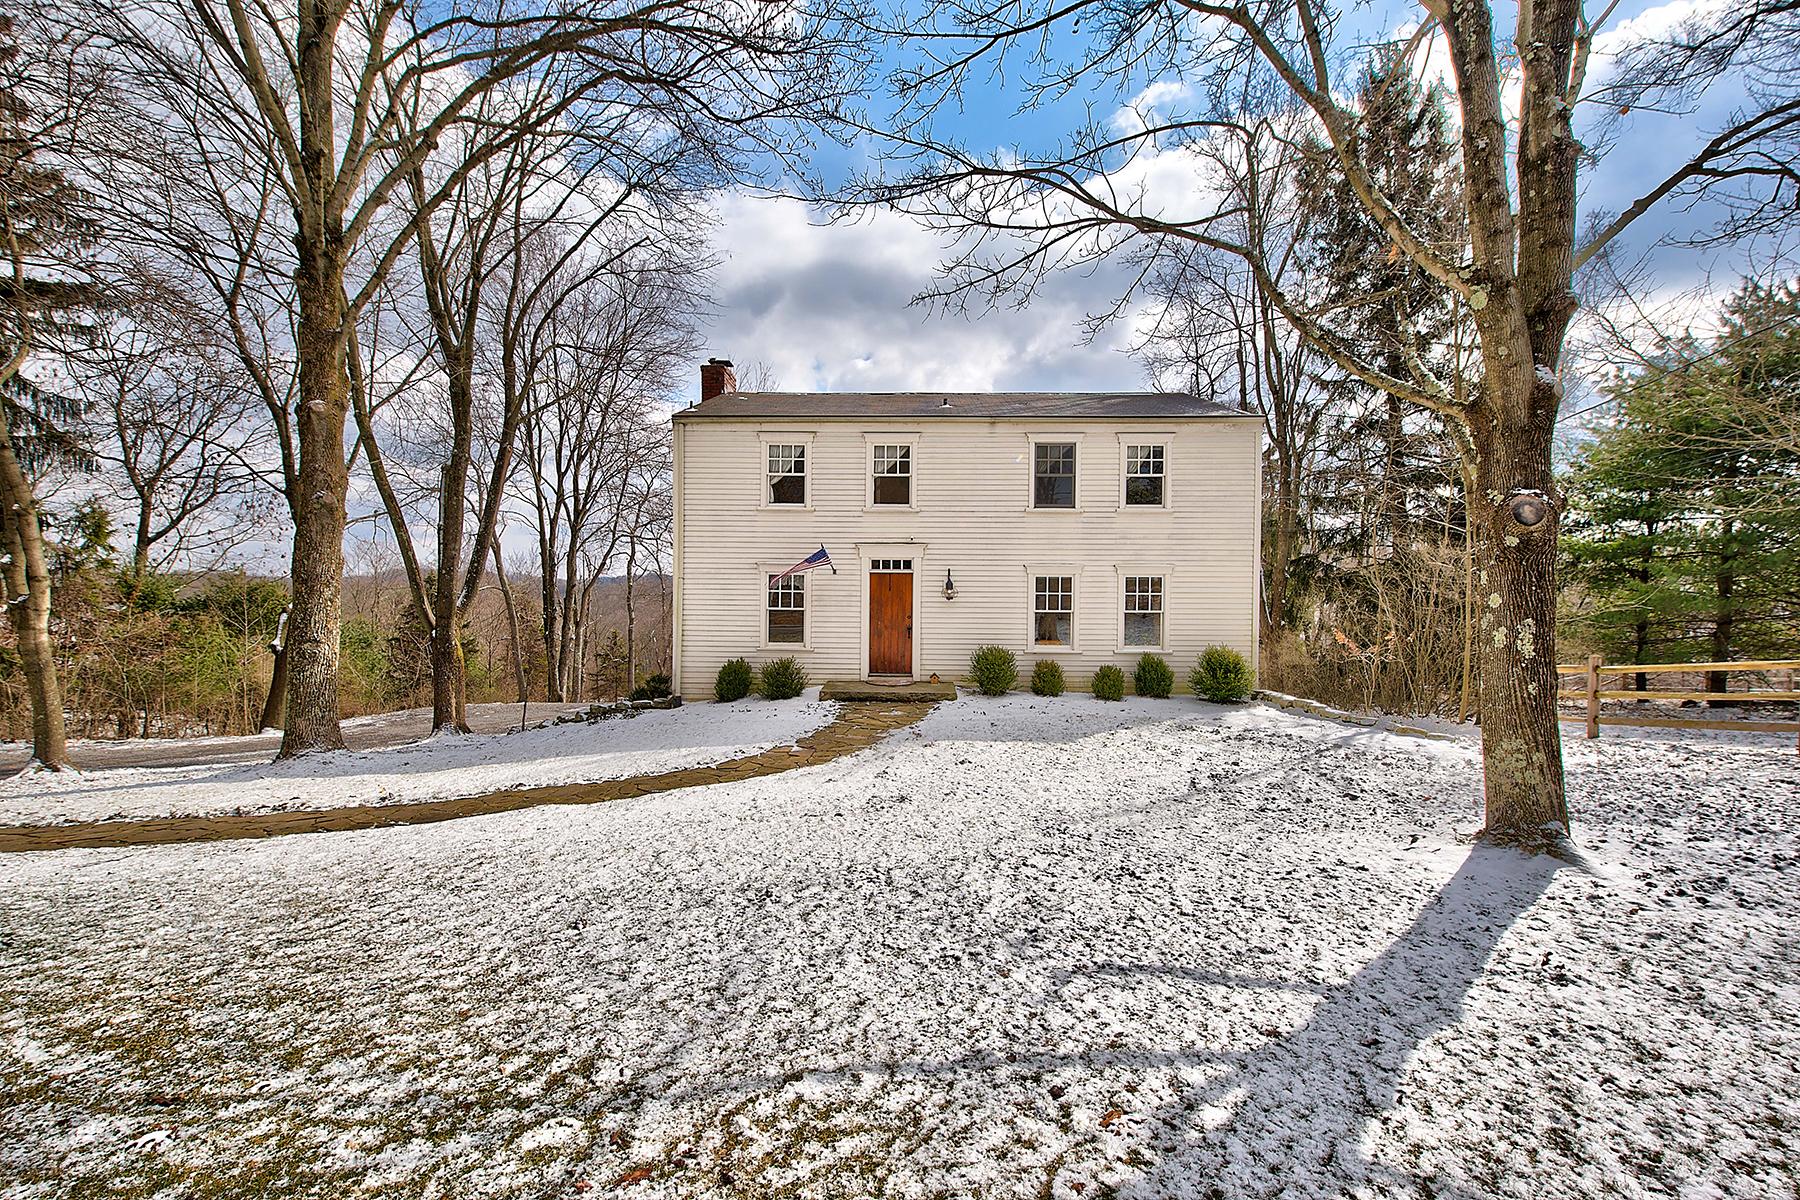 Single Family Homes για την Πώληση στο Sewickley, Πενσιλβανια 15143 Ηνωμένες Πολιτείες